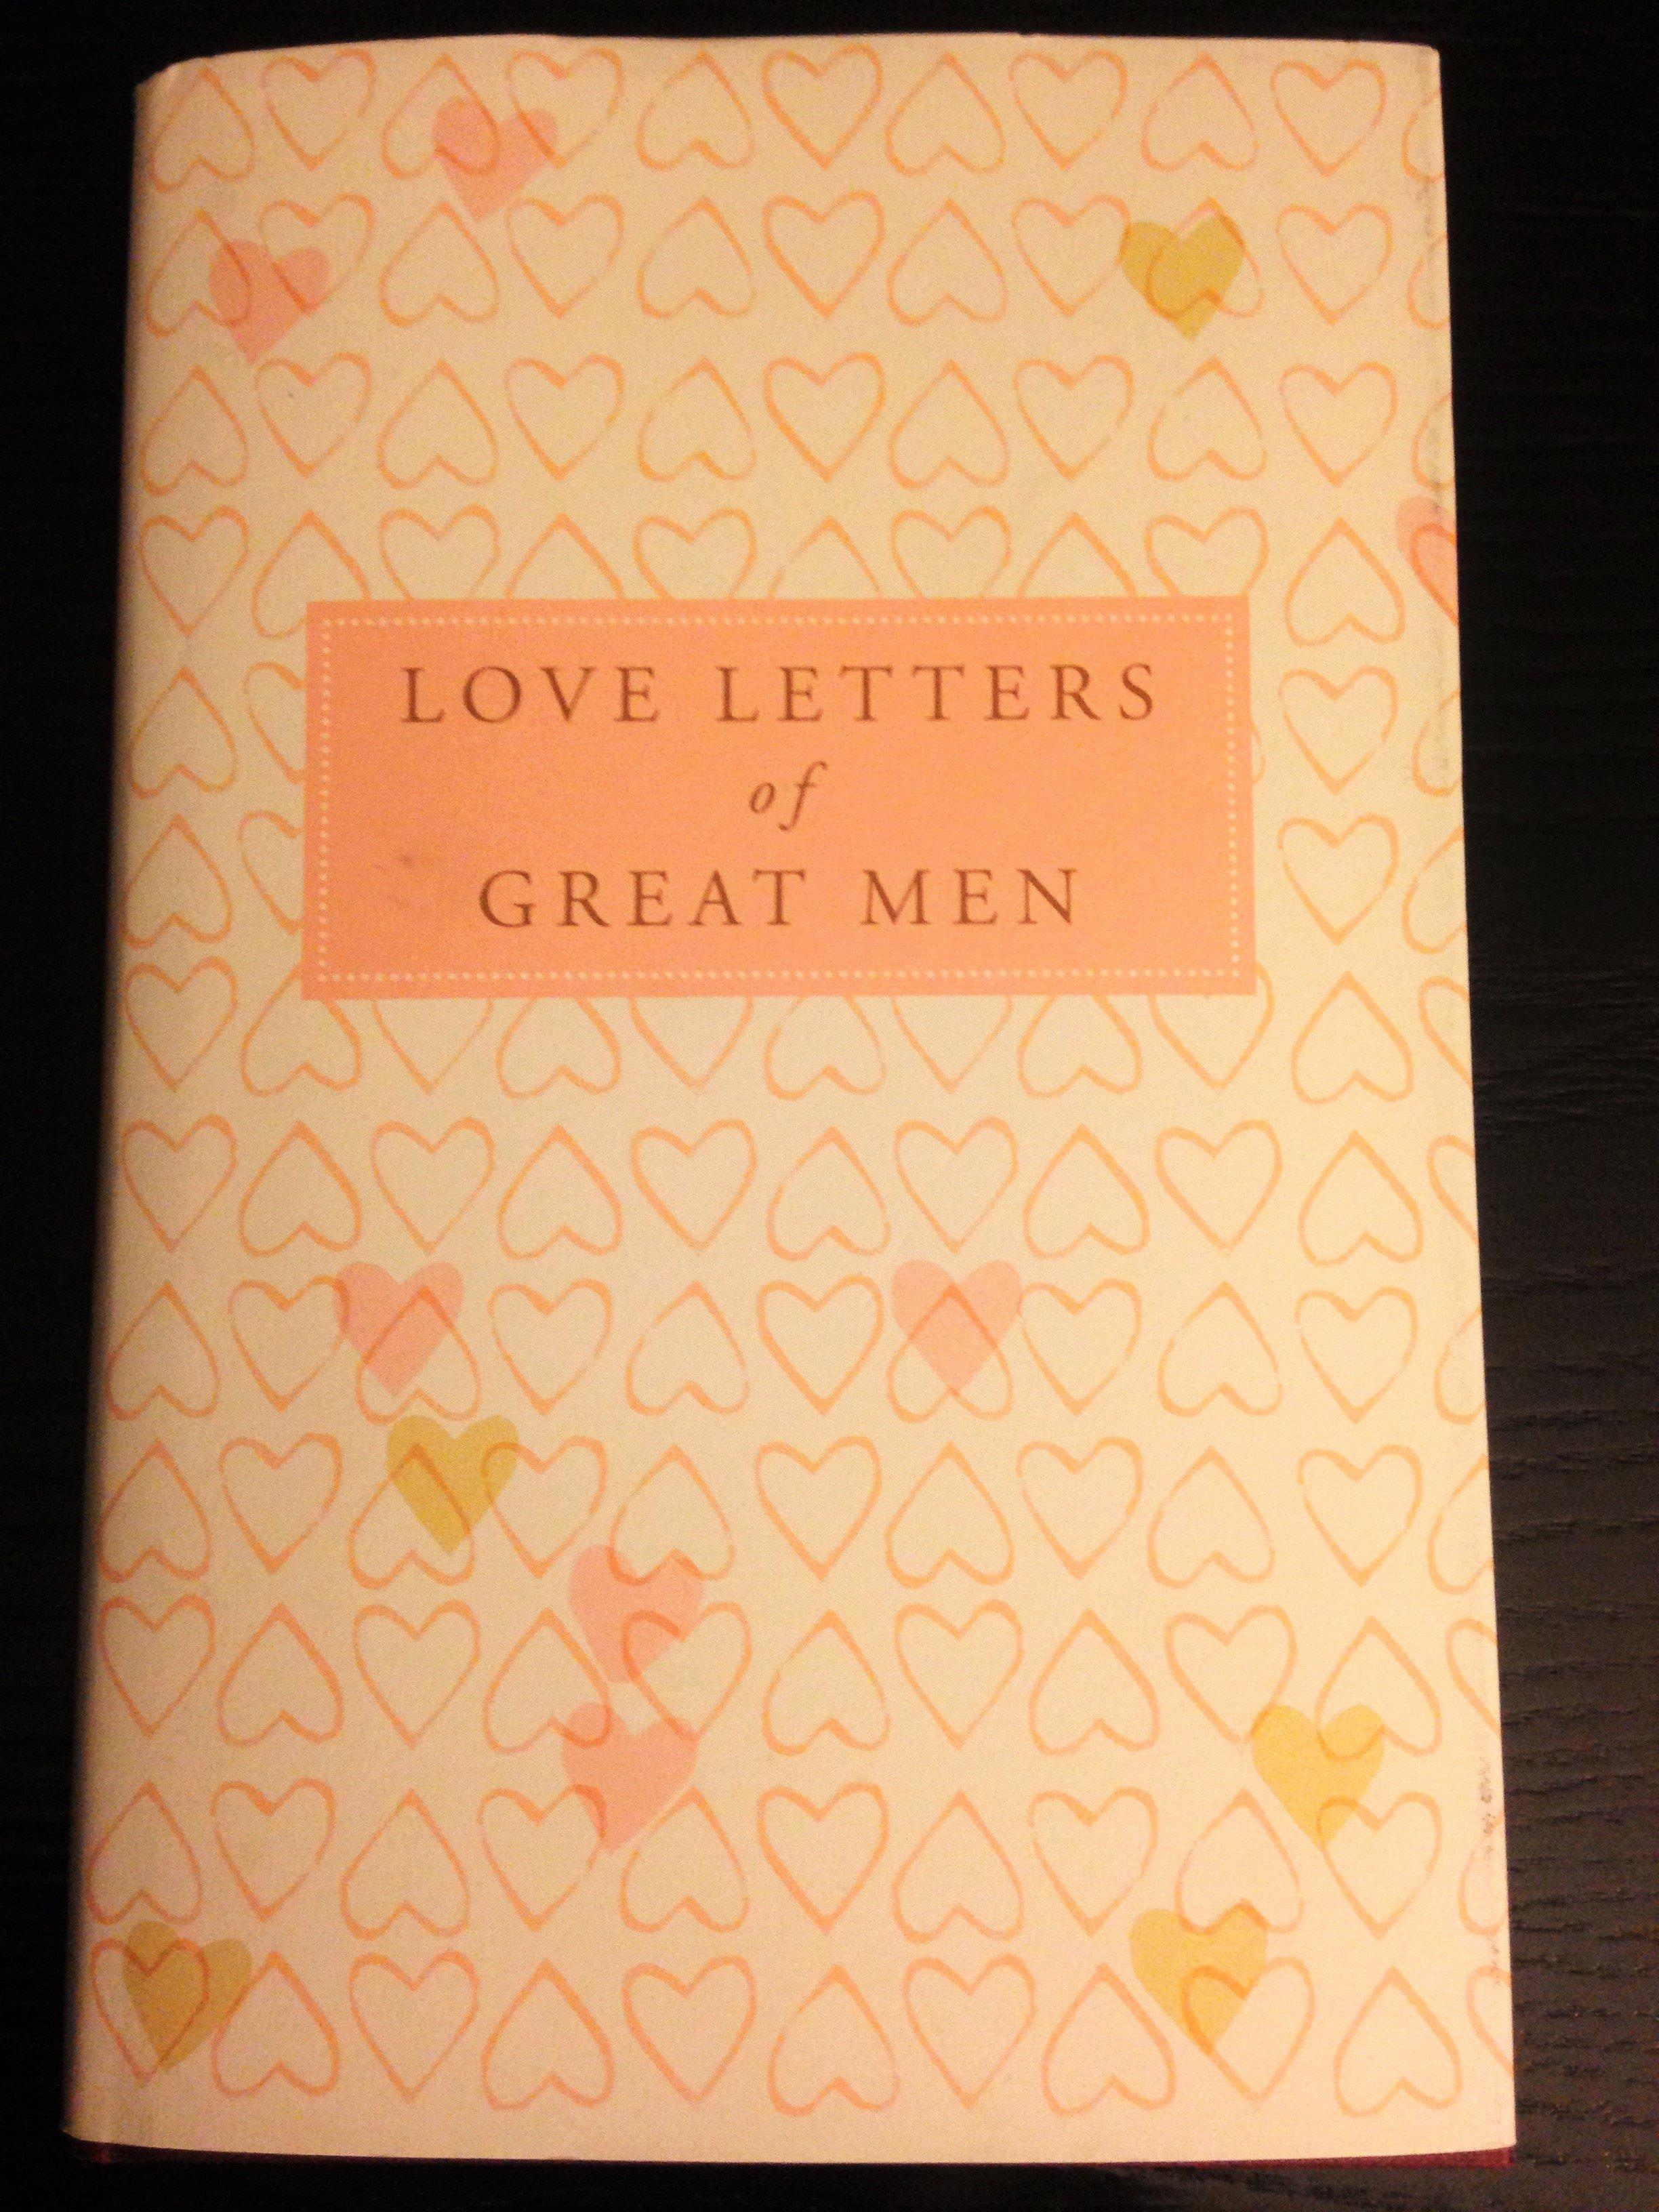 Love Letter by Great Men Lovely Love Letters Of Great Men